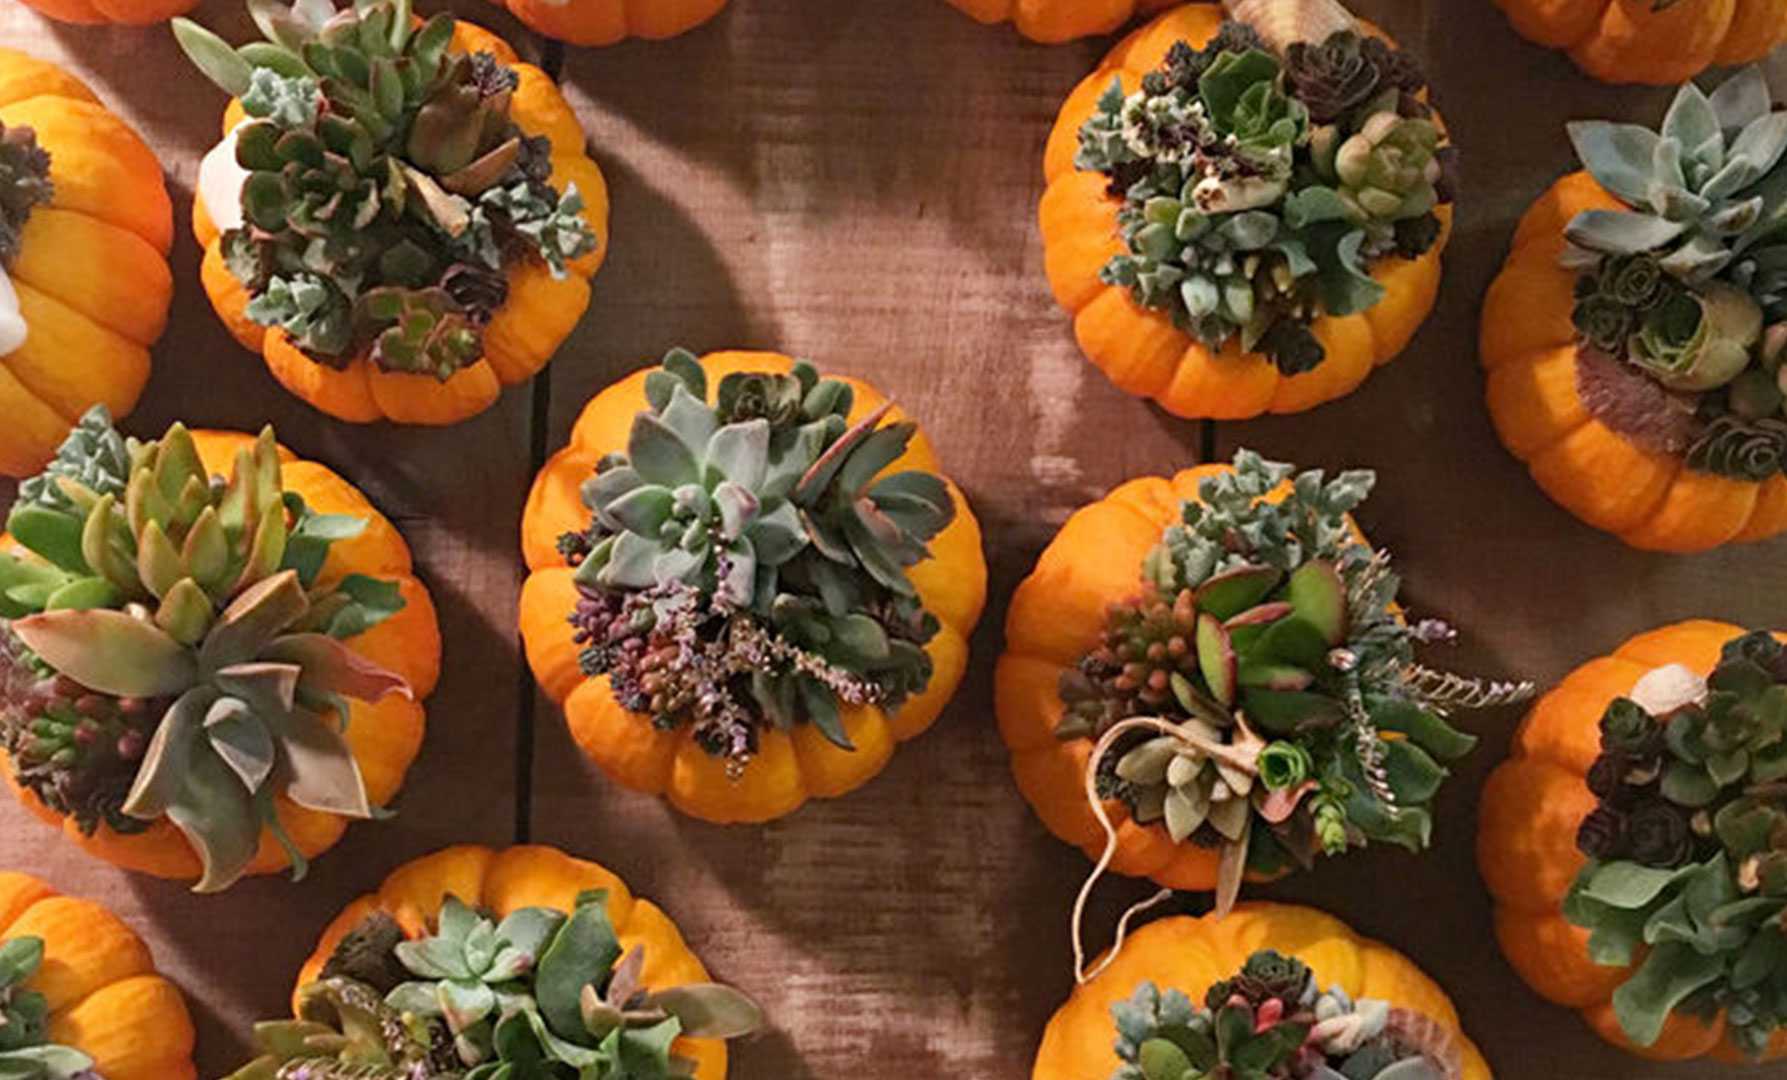 Home Inspiration: Fresh Ideas for Pumpkin Décor